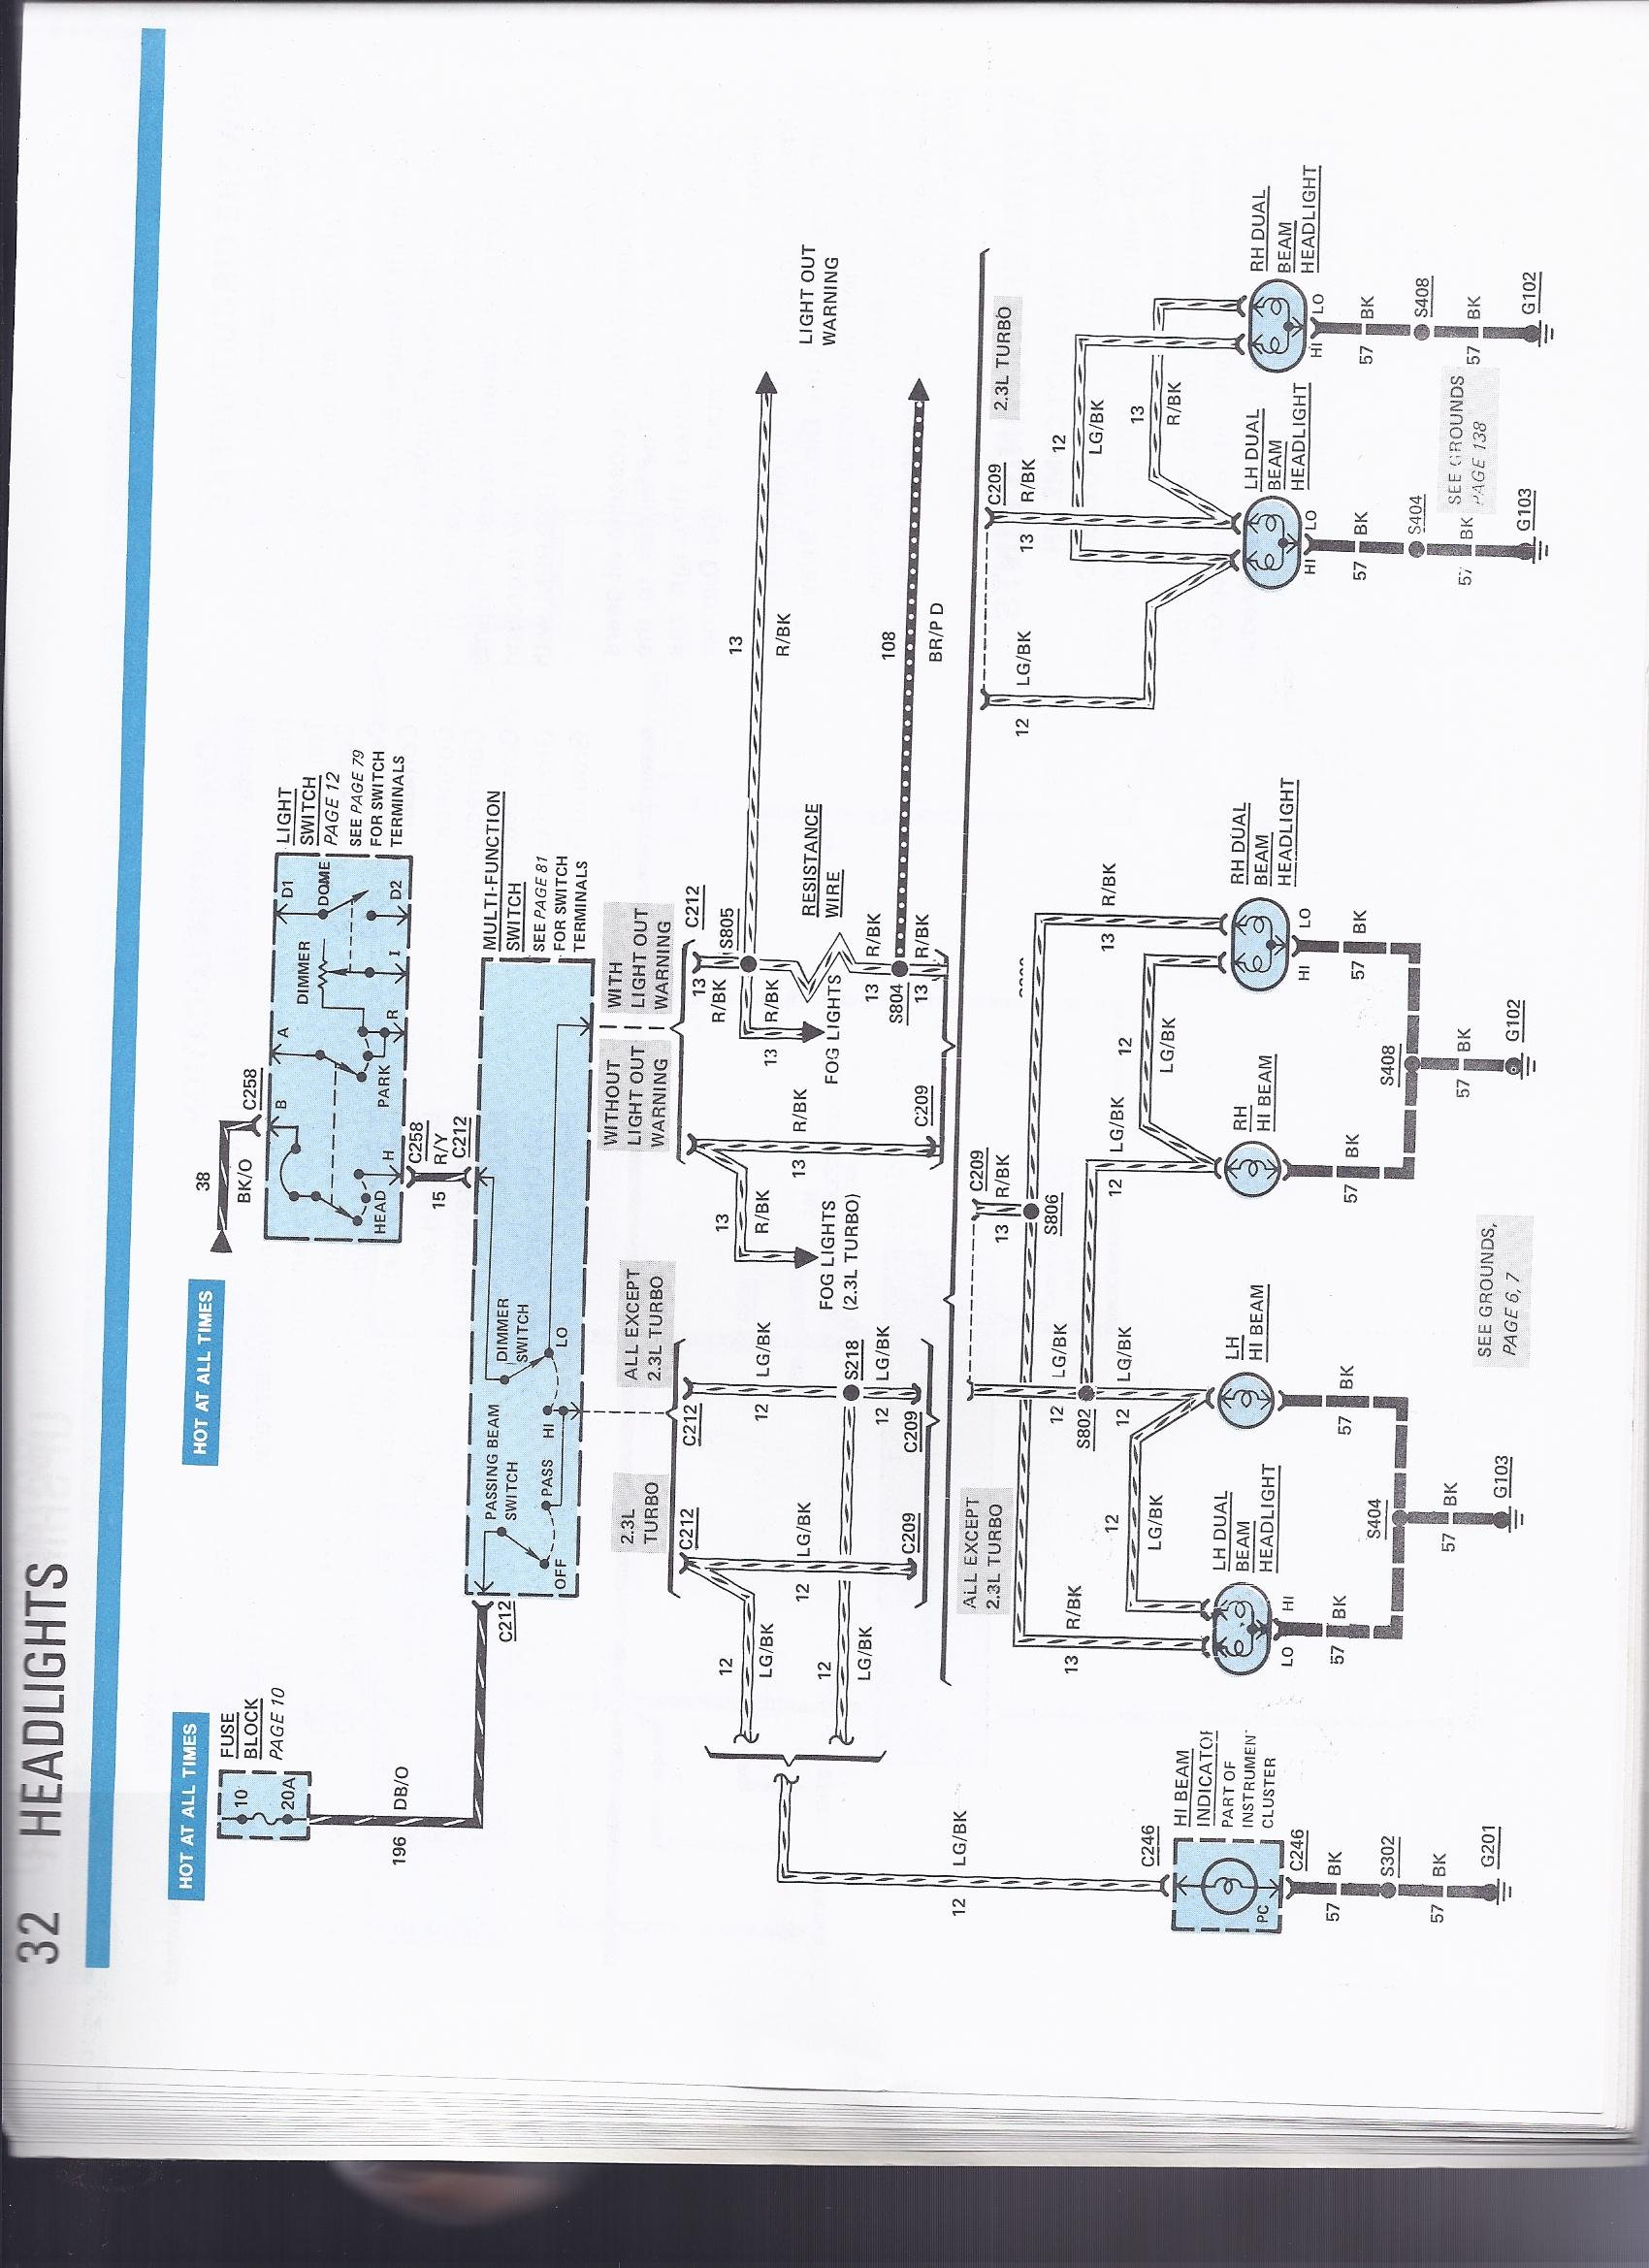 1984 Mustang Wiring Diagram from www.allfordmustangs.com